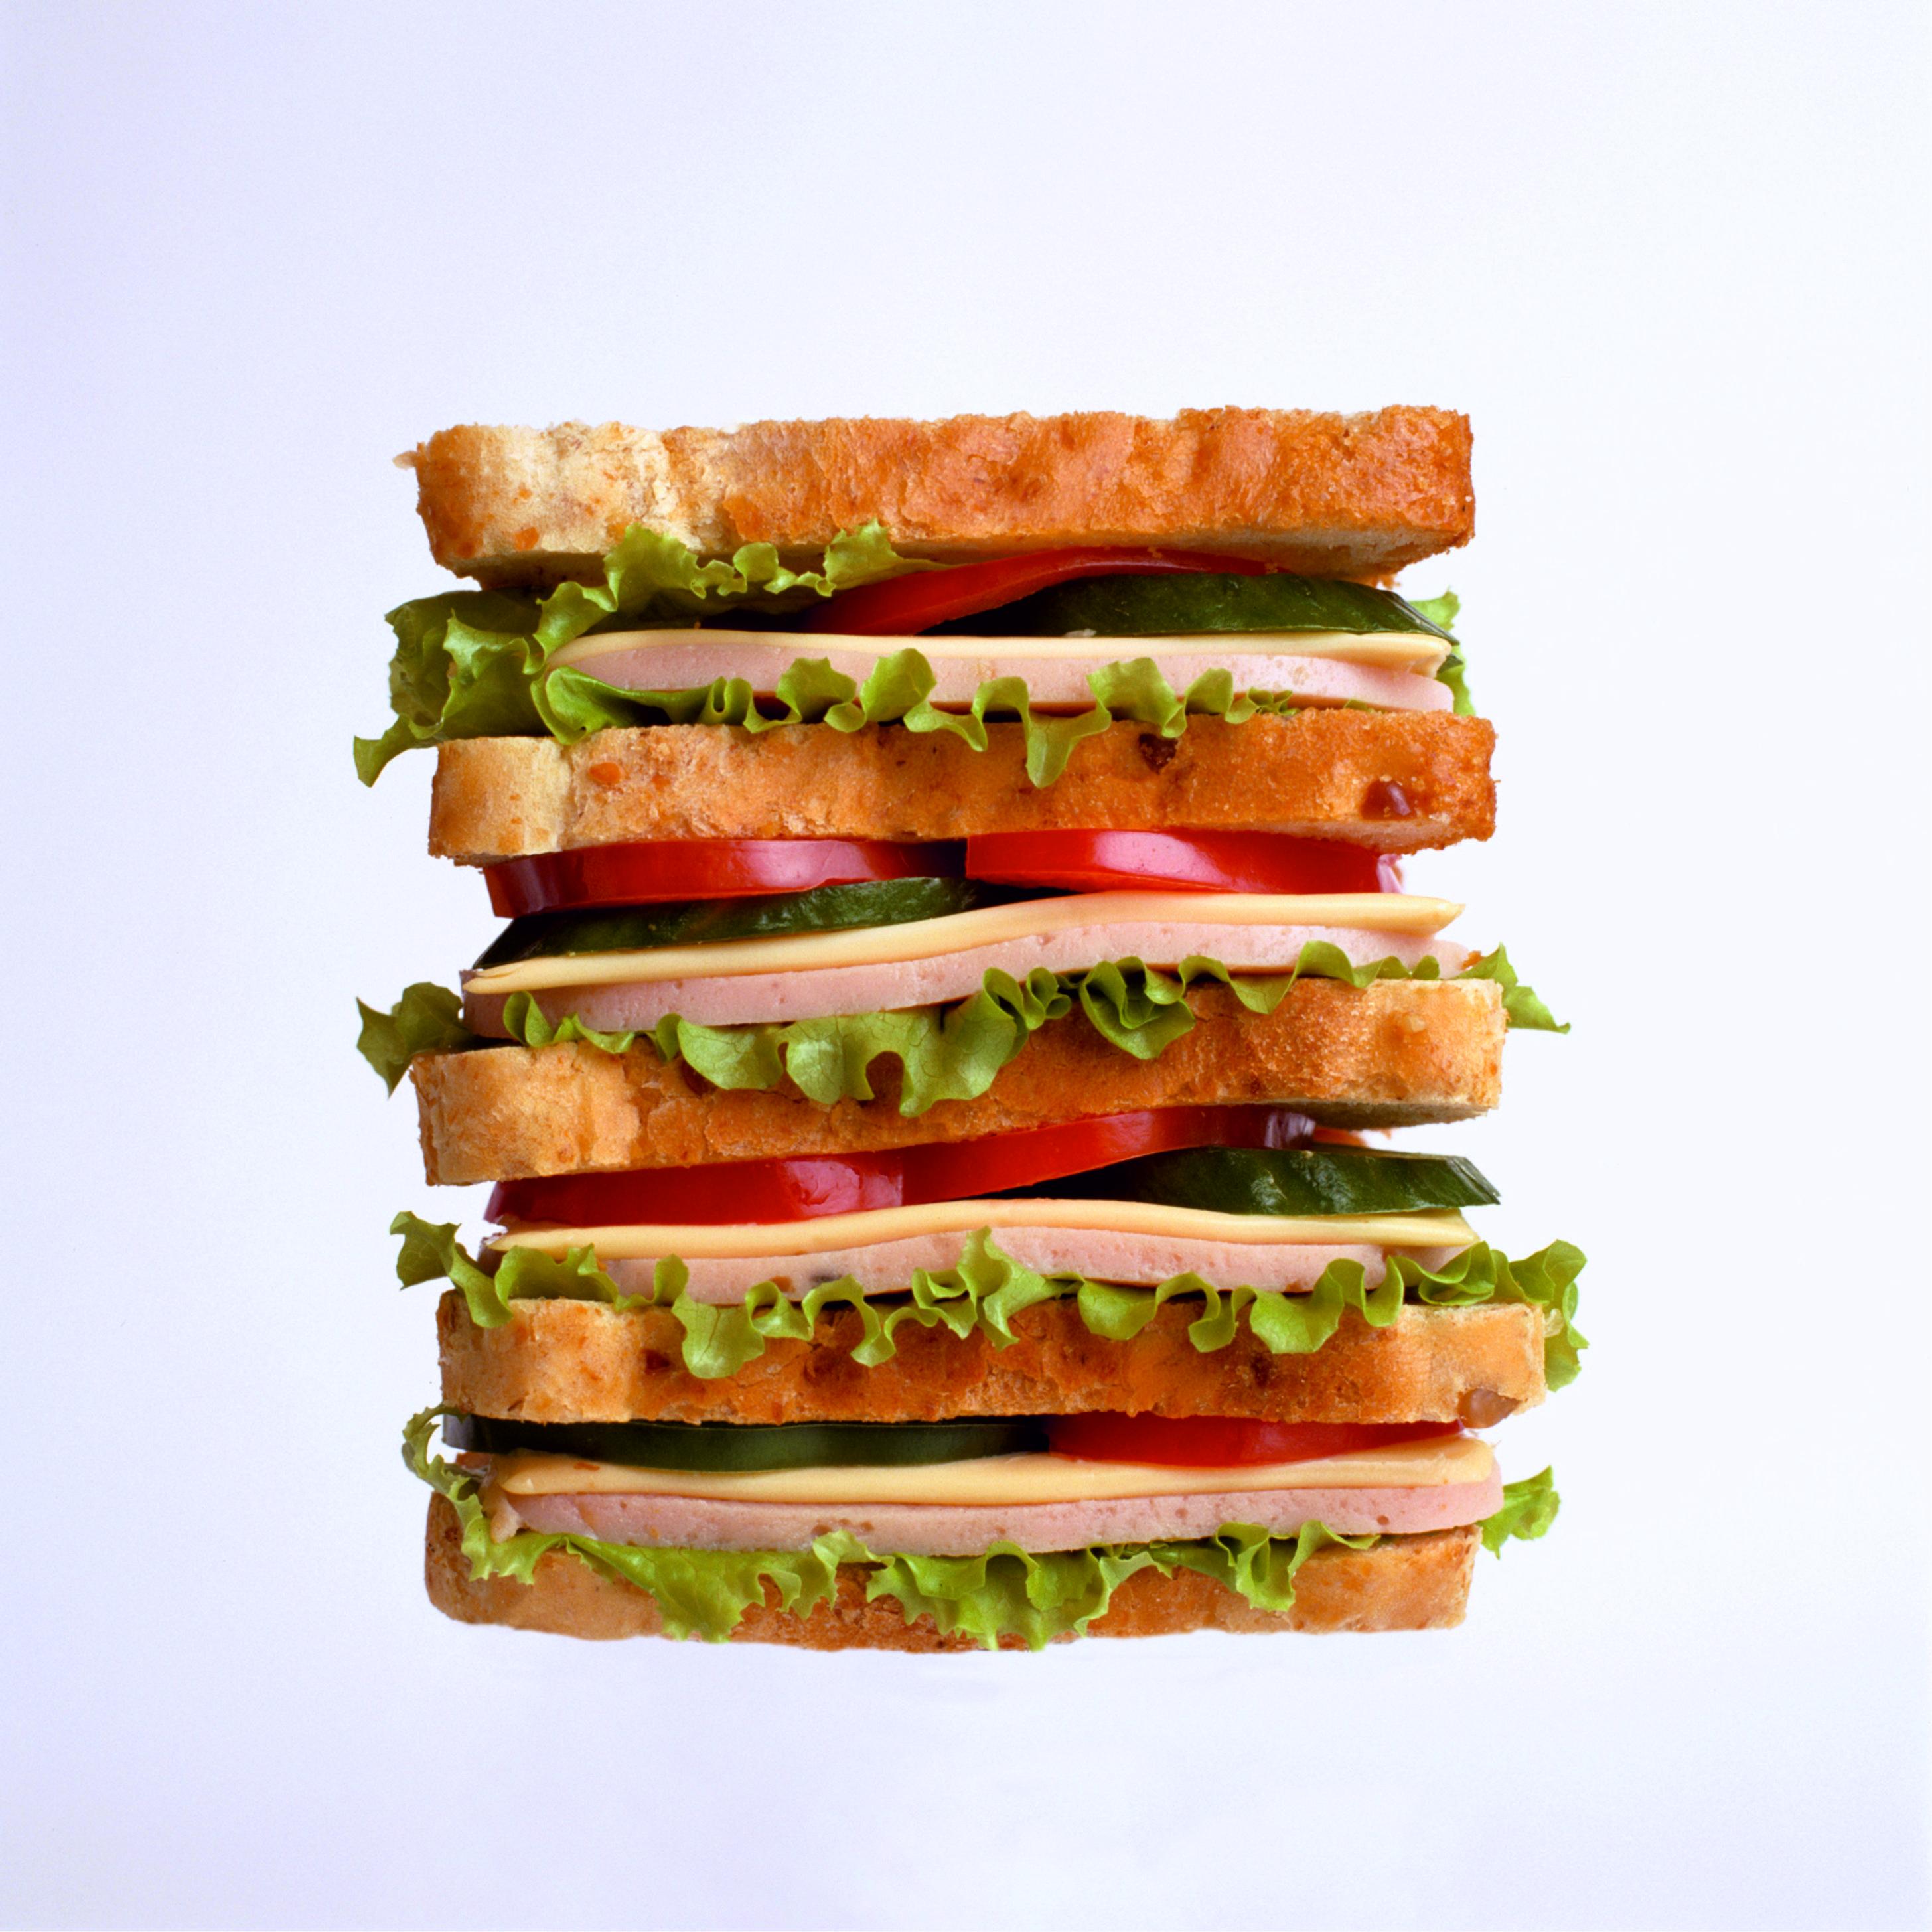 Ветчина гамбургер завтрак  № 2141527 загрузить